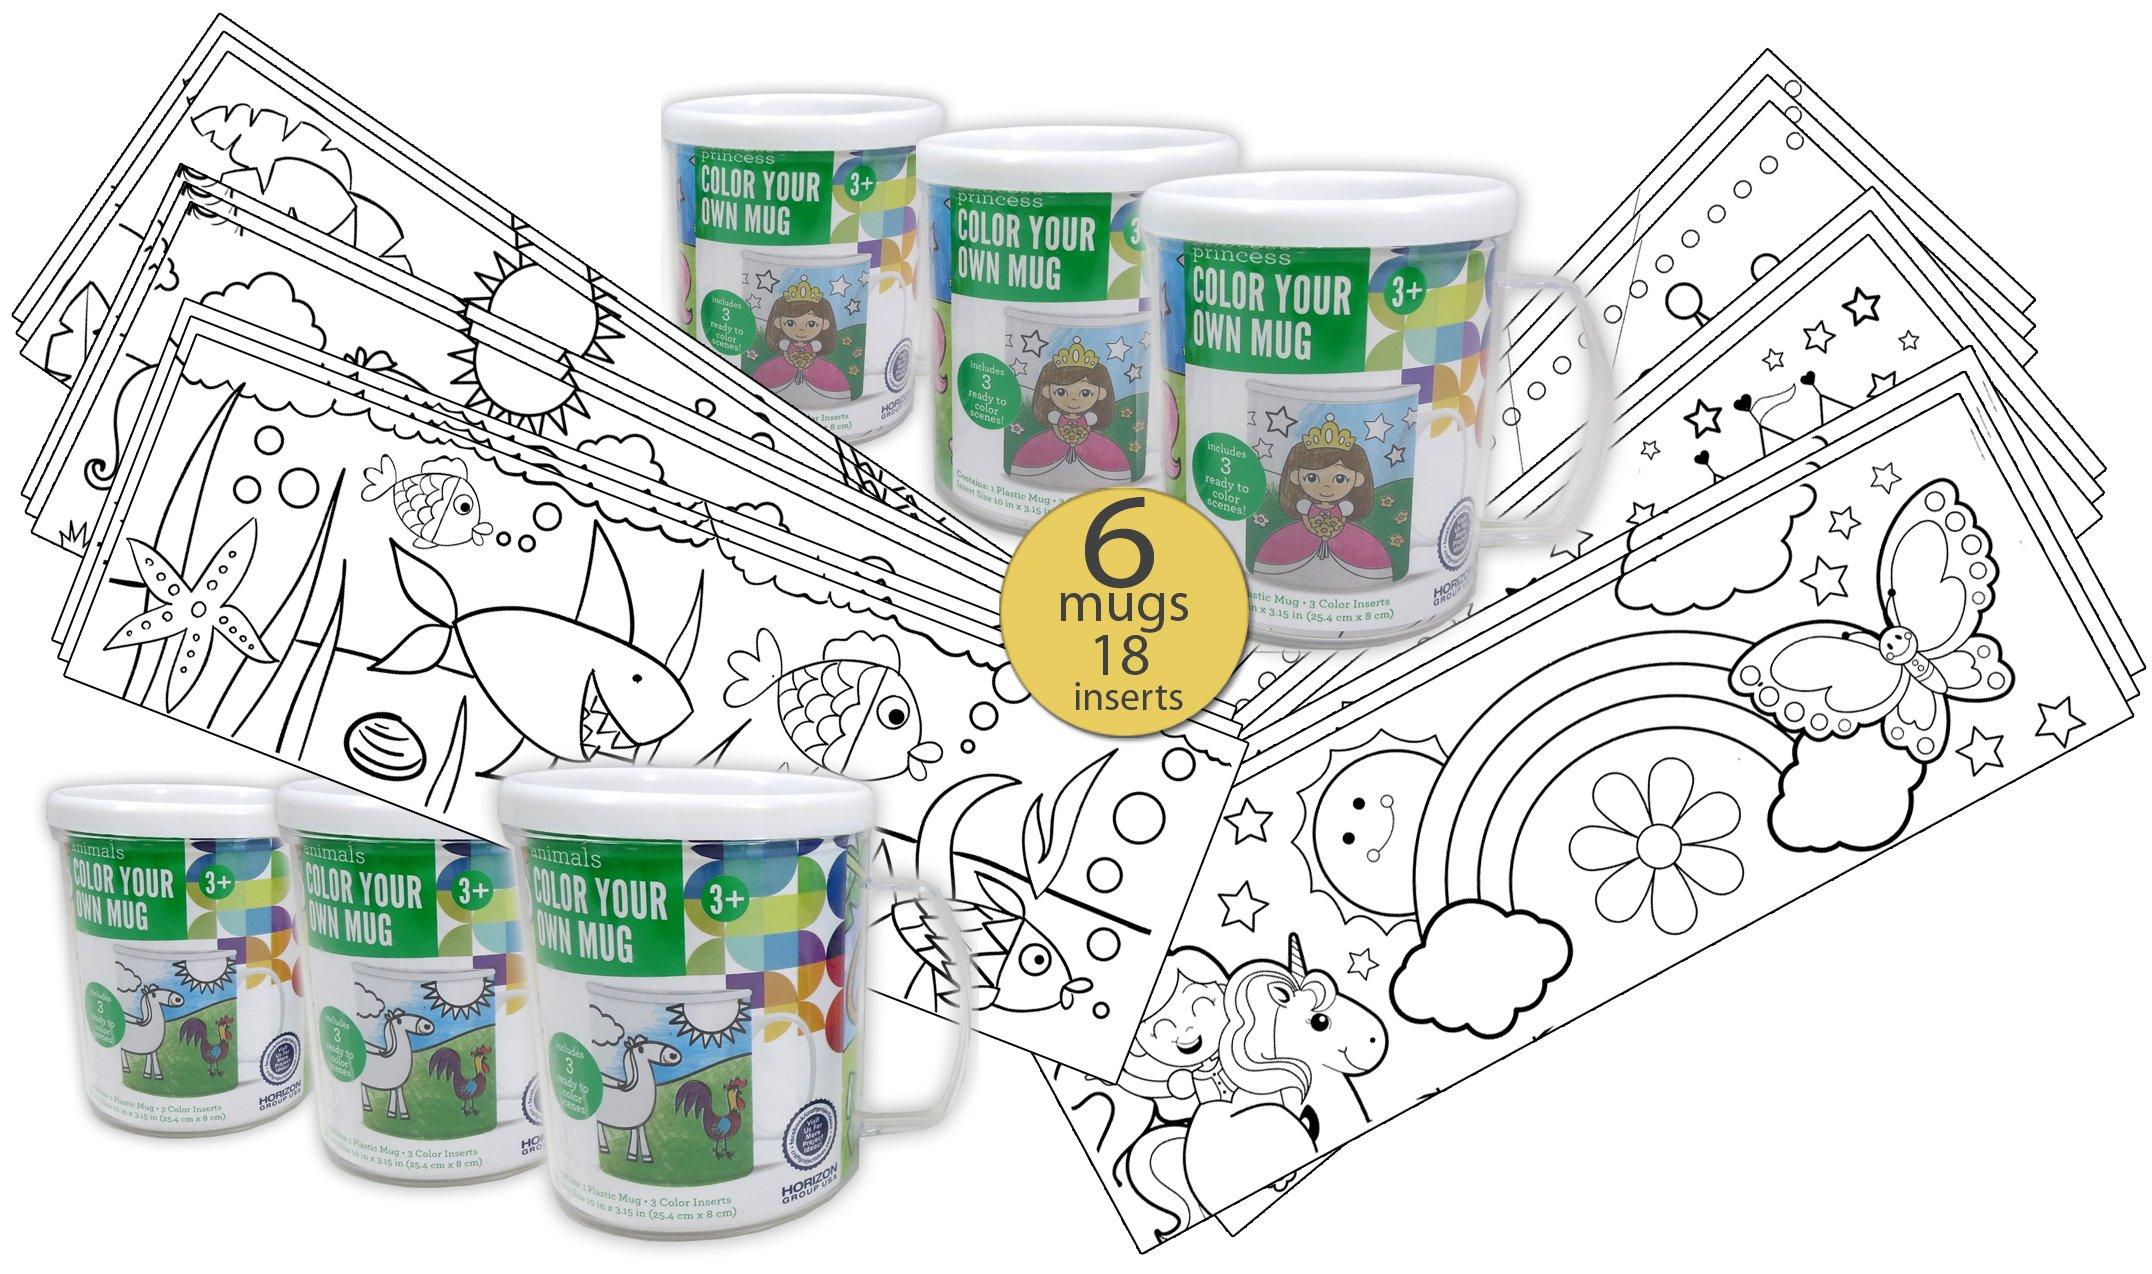 Set of 6 - Color Your Own Coloring Mug for Boys & Girls - Wholesale Bulk Set - 18 Assorted Inserts